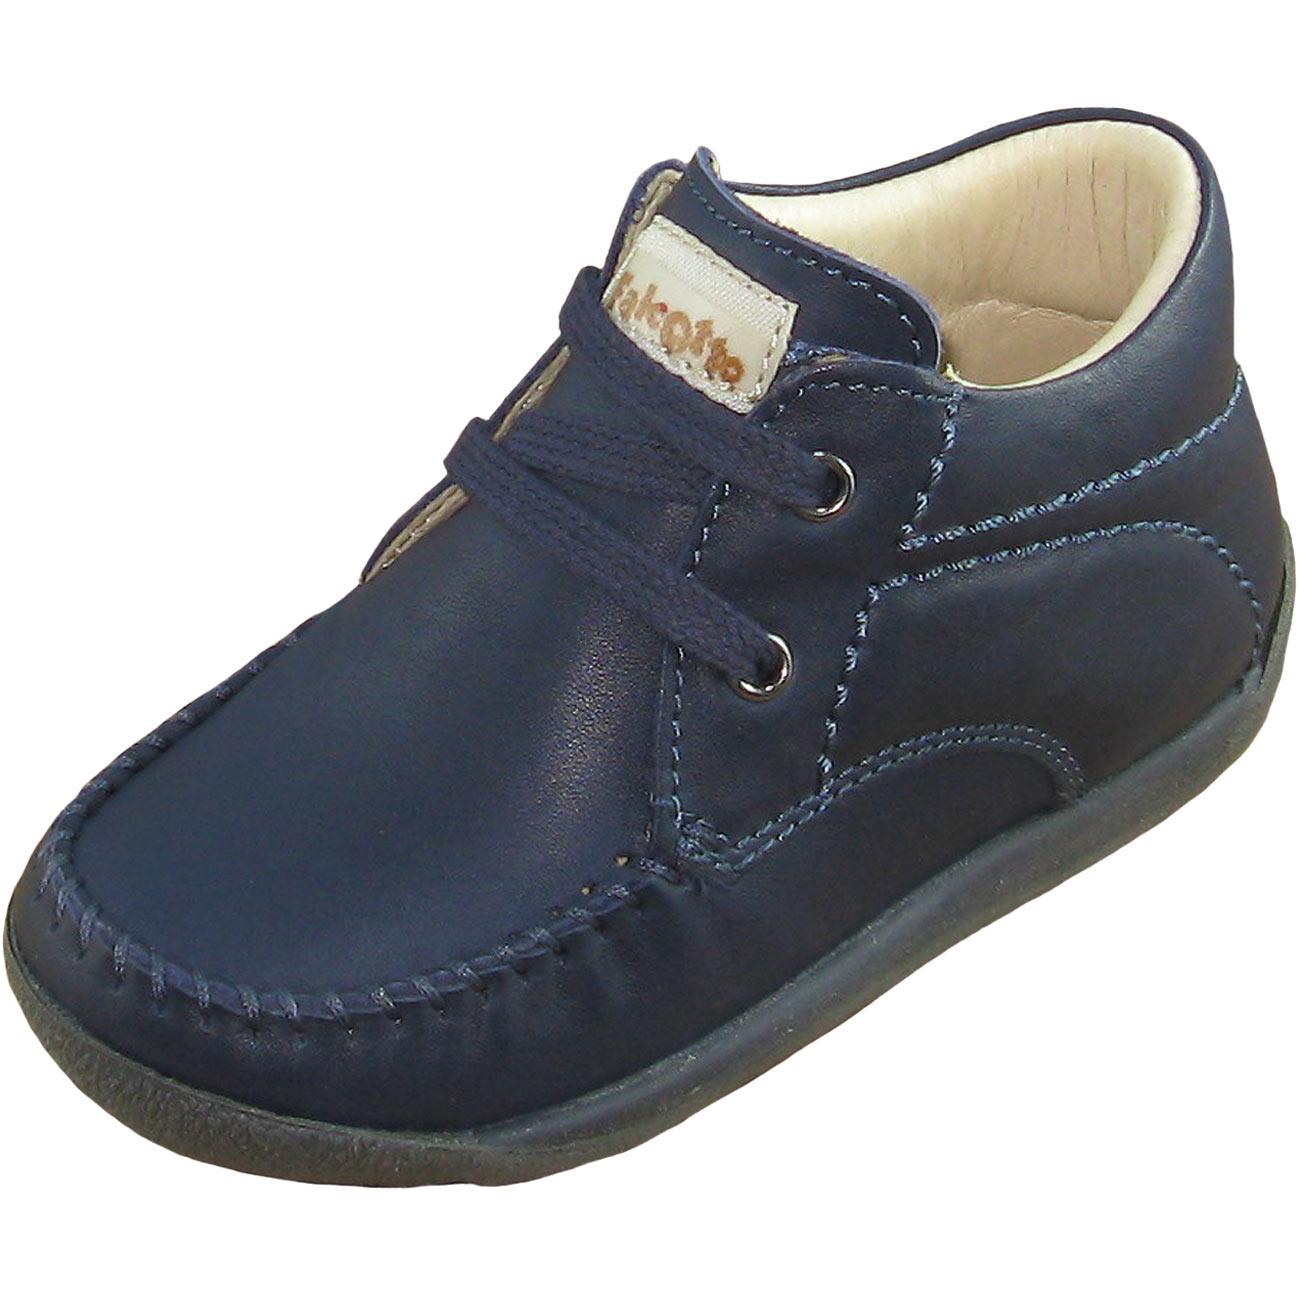 Alcott Shoes Online